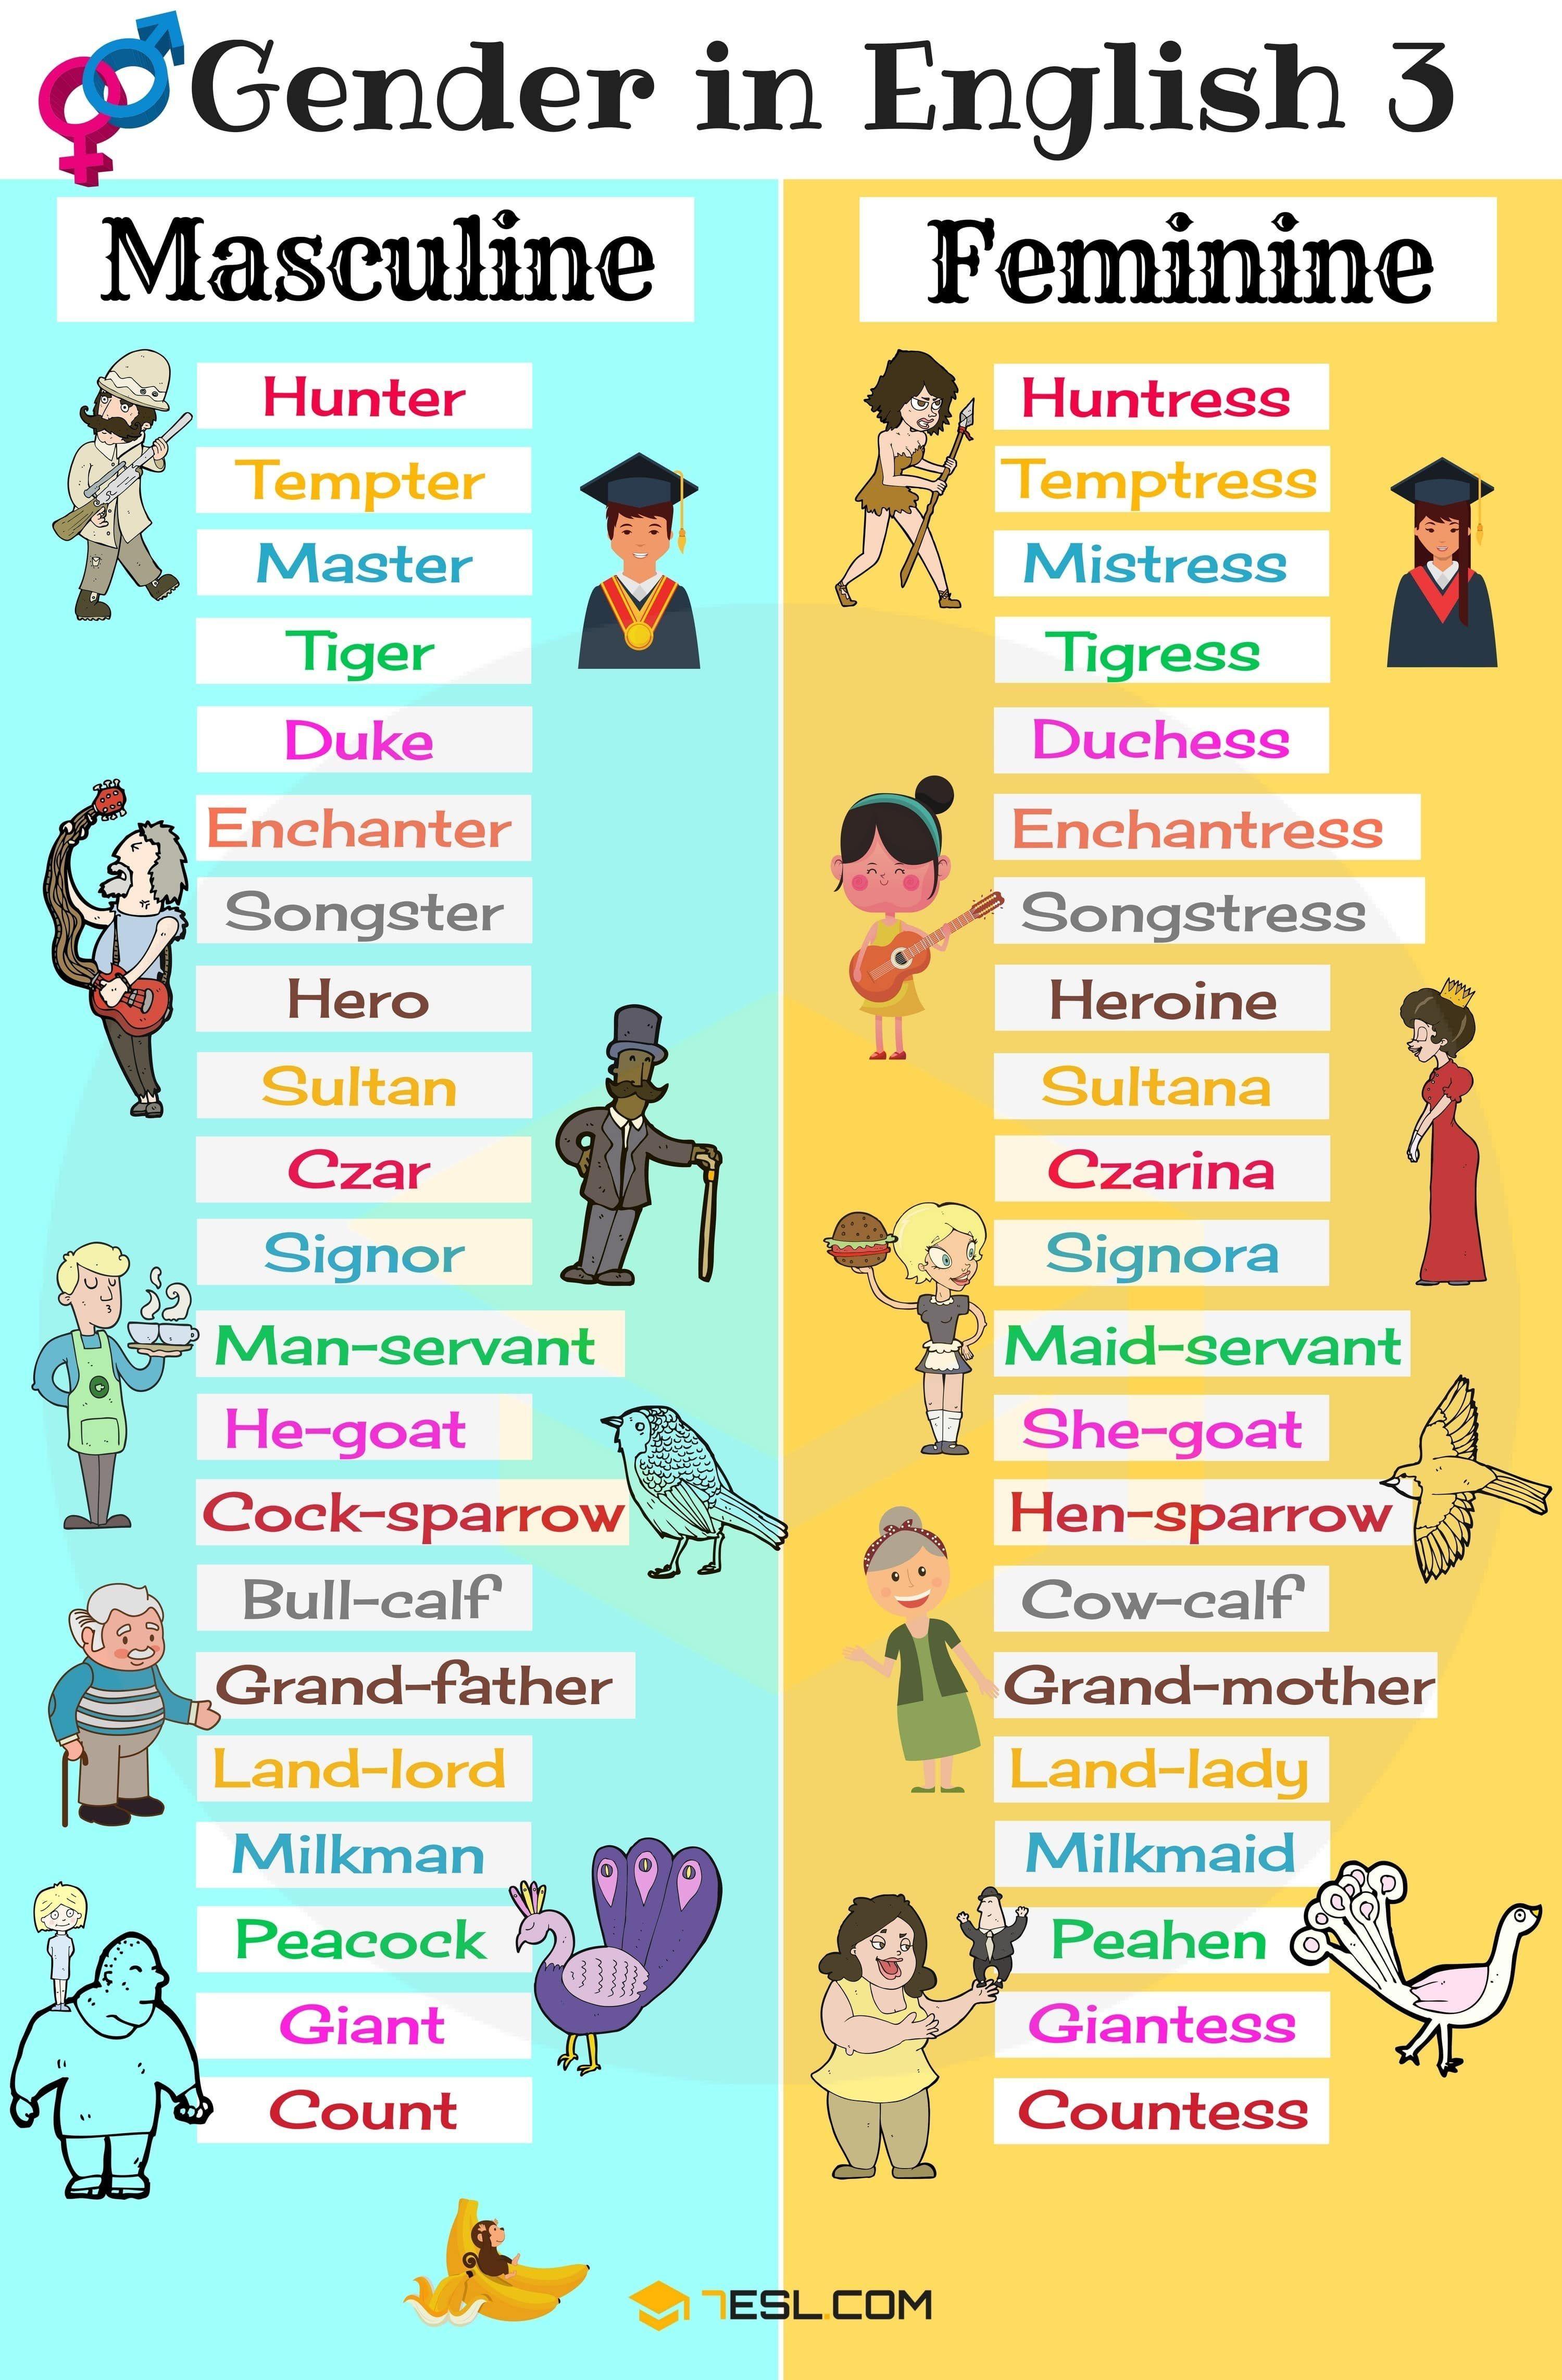 Masculine Feminine English Gender Useful Nouns List